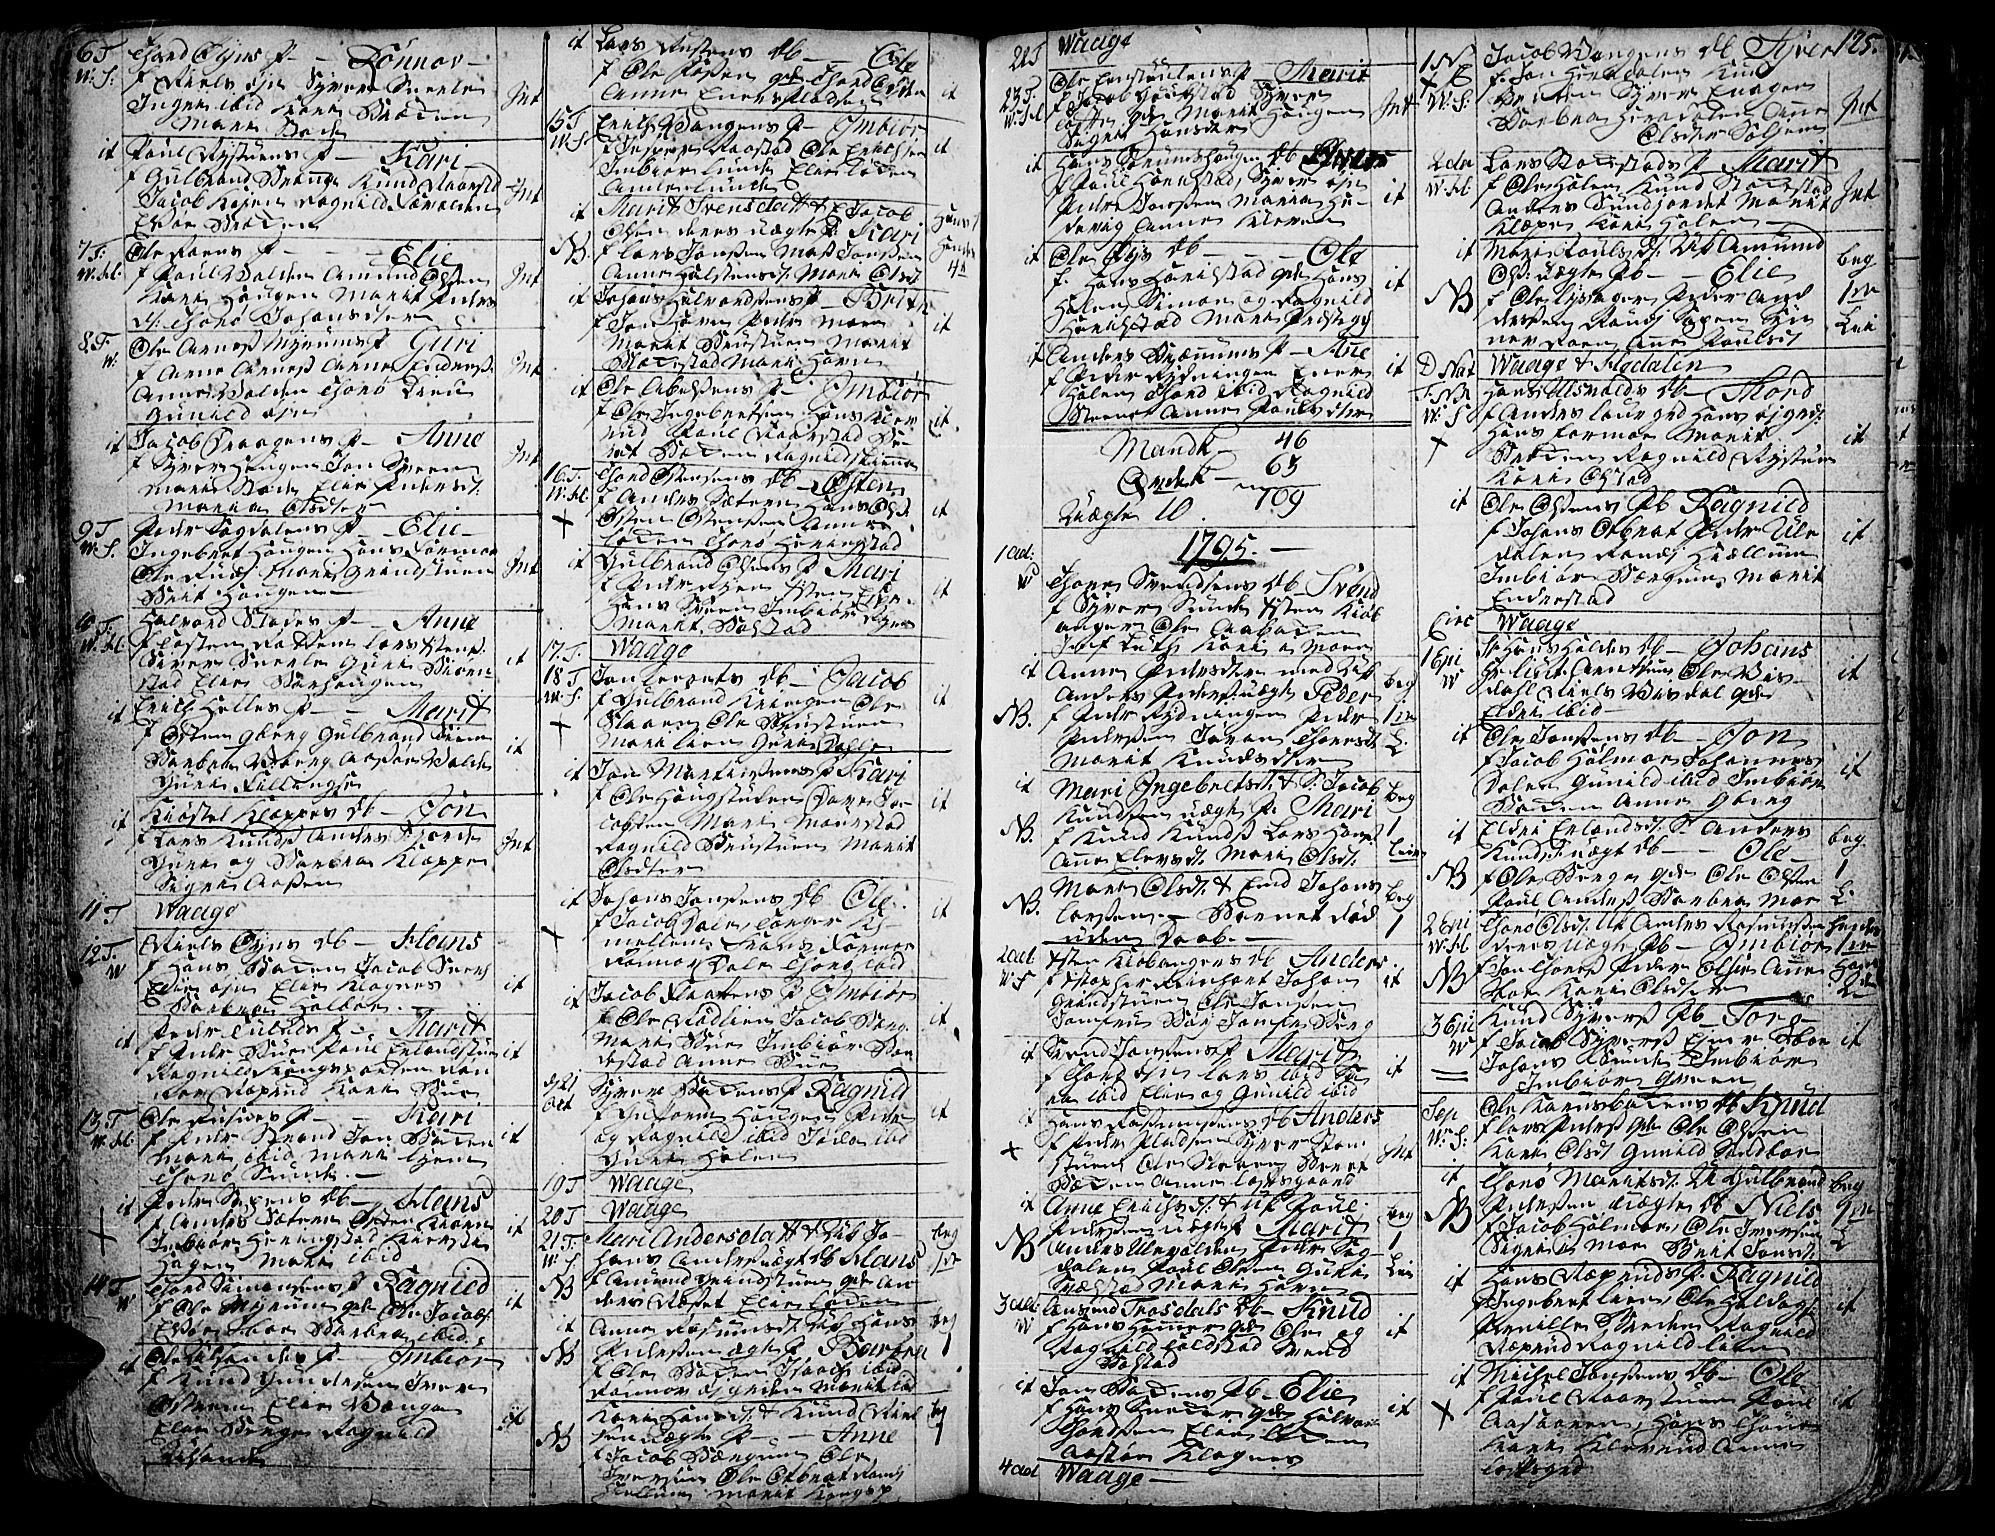 SAH, Vågå prestekontor, Ministerialbok nr. 1, 1739-1810, s. 125